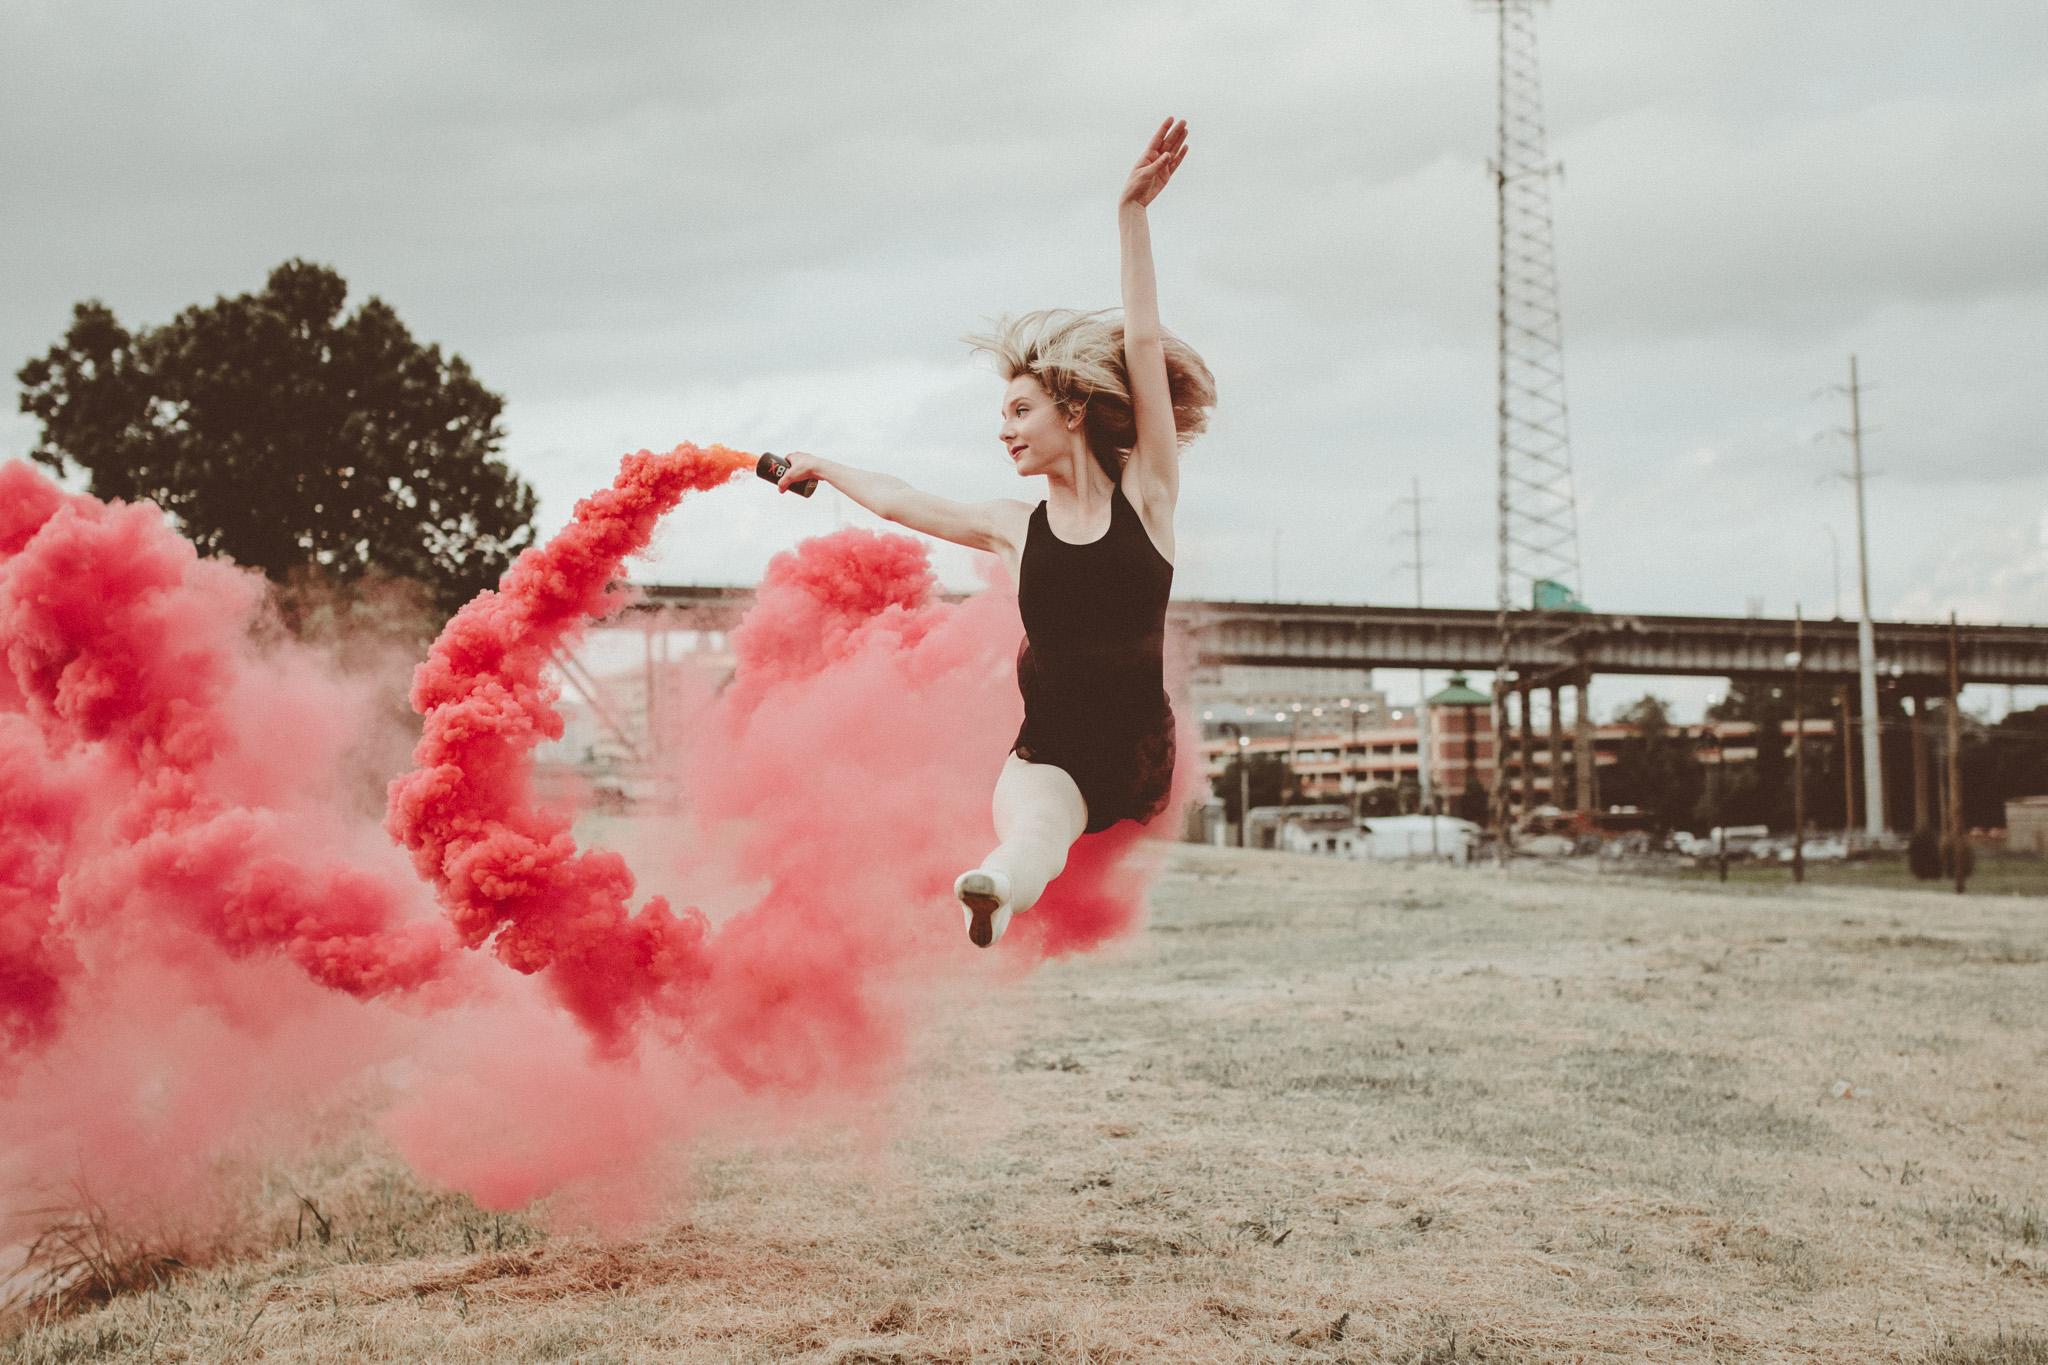 Modern, urban, lifestyle portrait of a ballerina with a smoke grenade. Downtown Baton Rouge, Louisiana